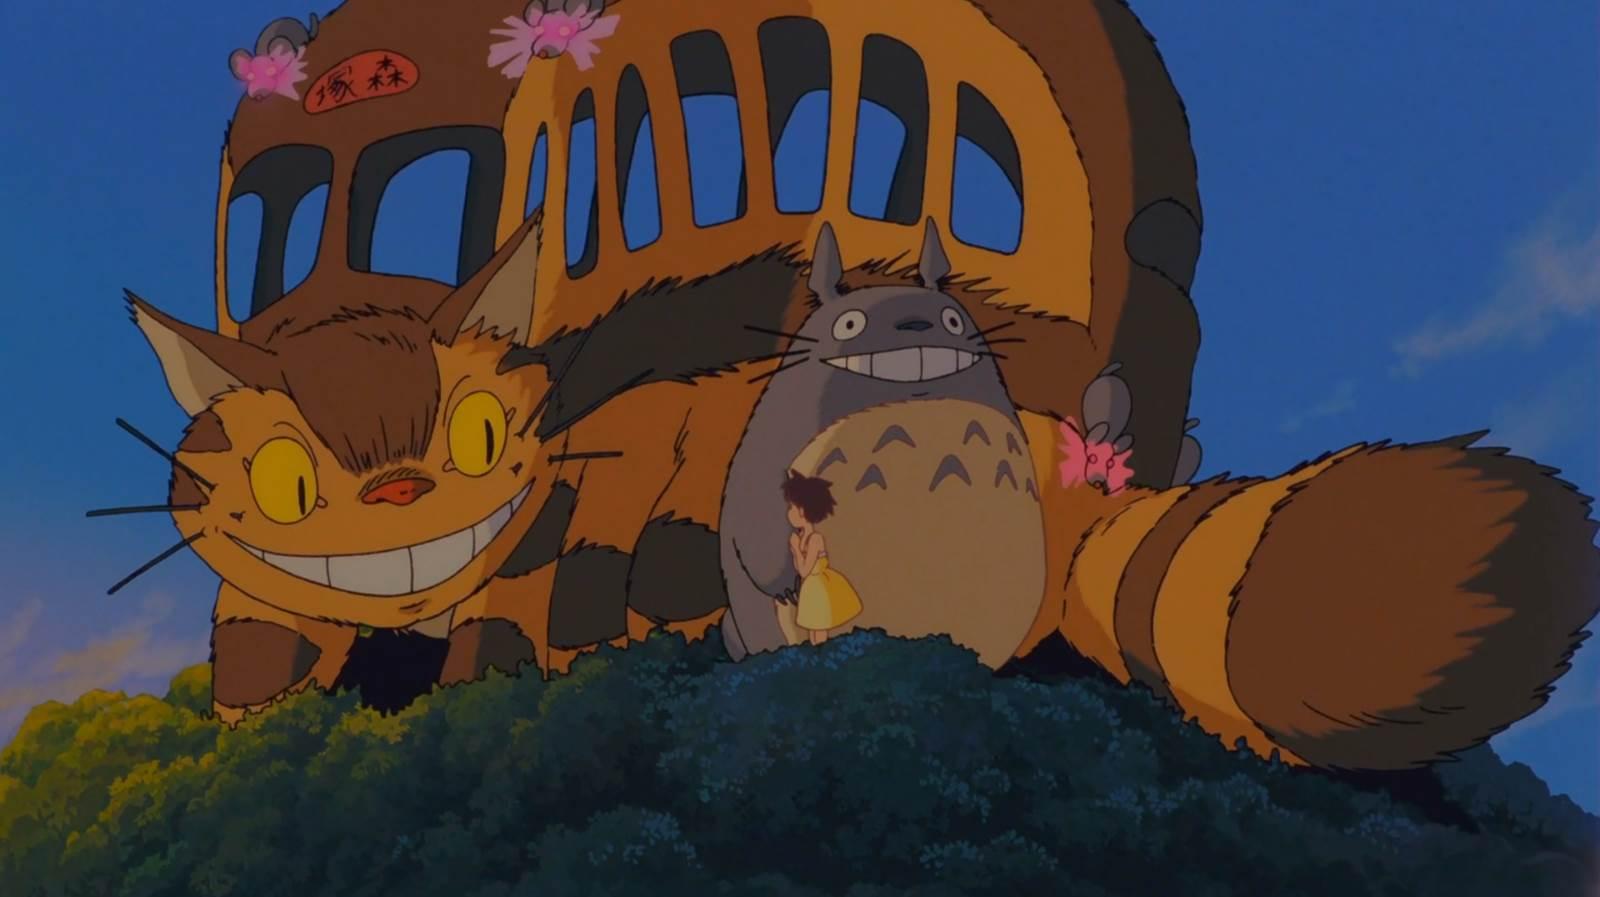 Tonari no Totoro, Satsuki, Totoro, and the cat-bus